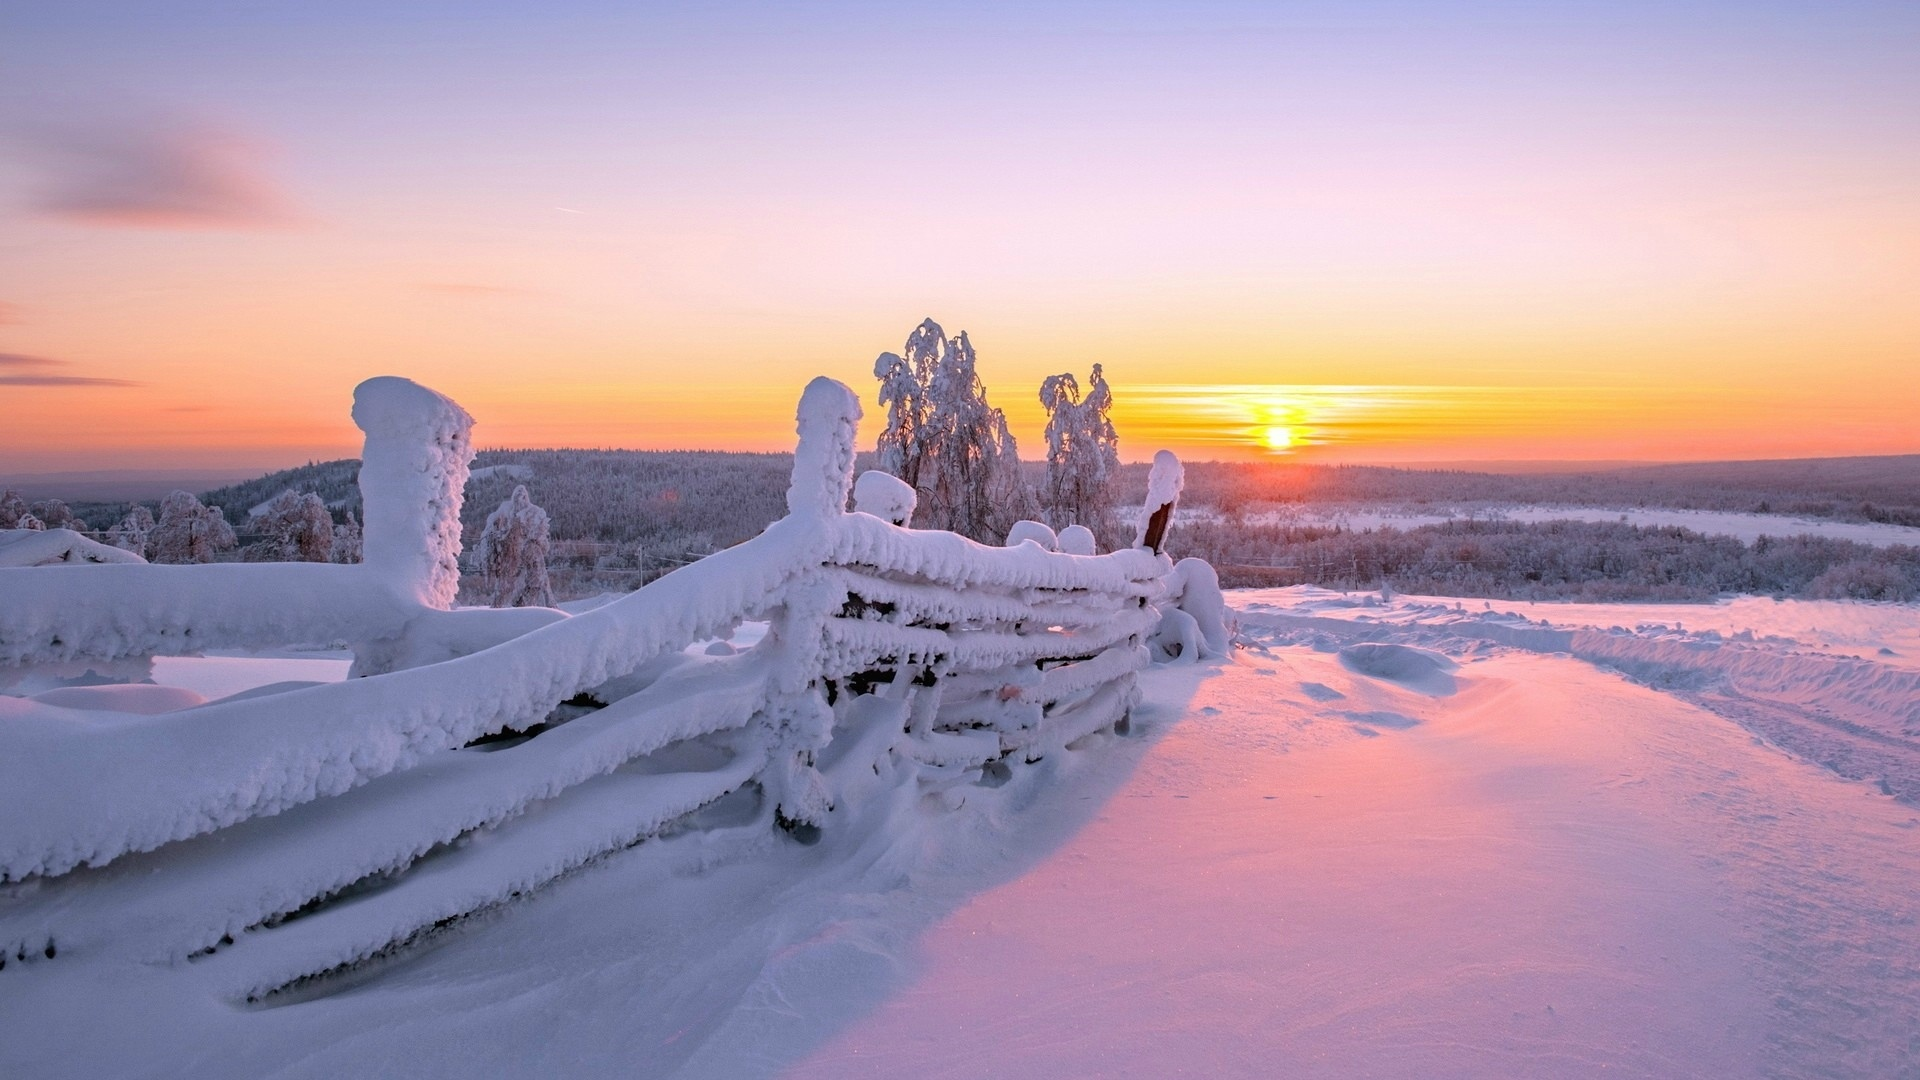 Winter Sun Wallpaper Winter Nature Wallpapers in jpg format for